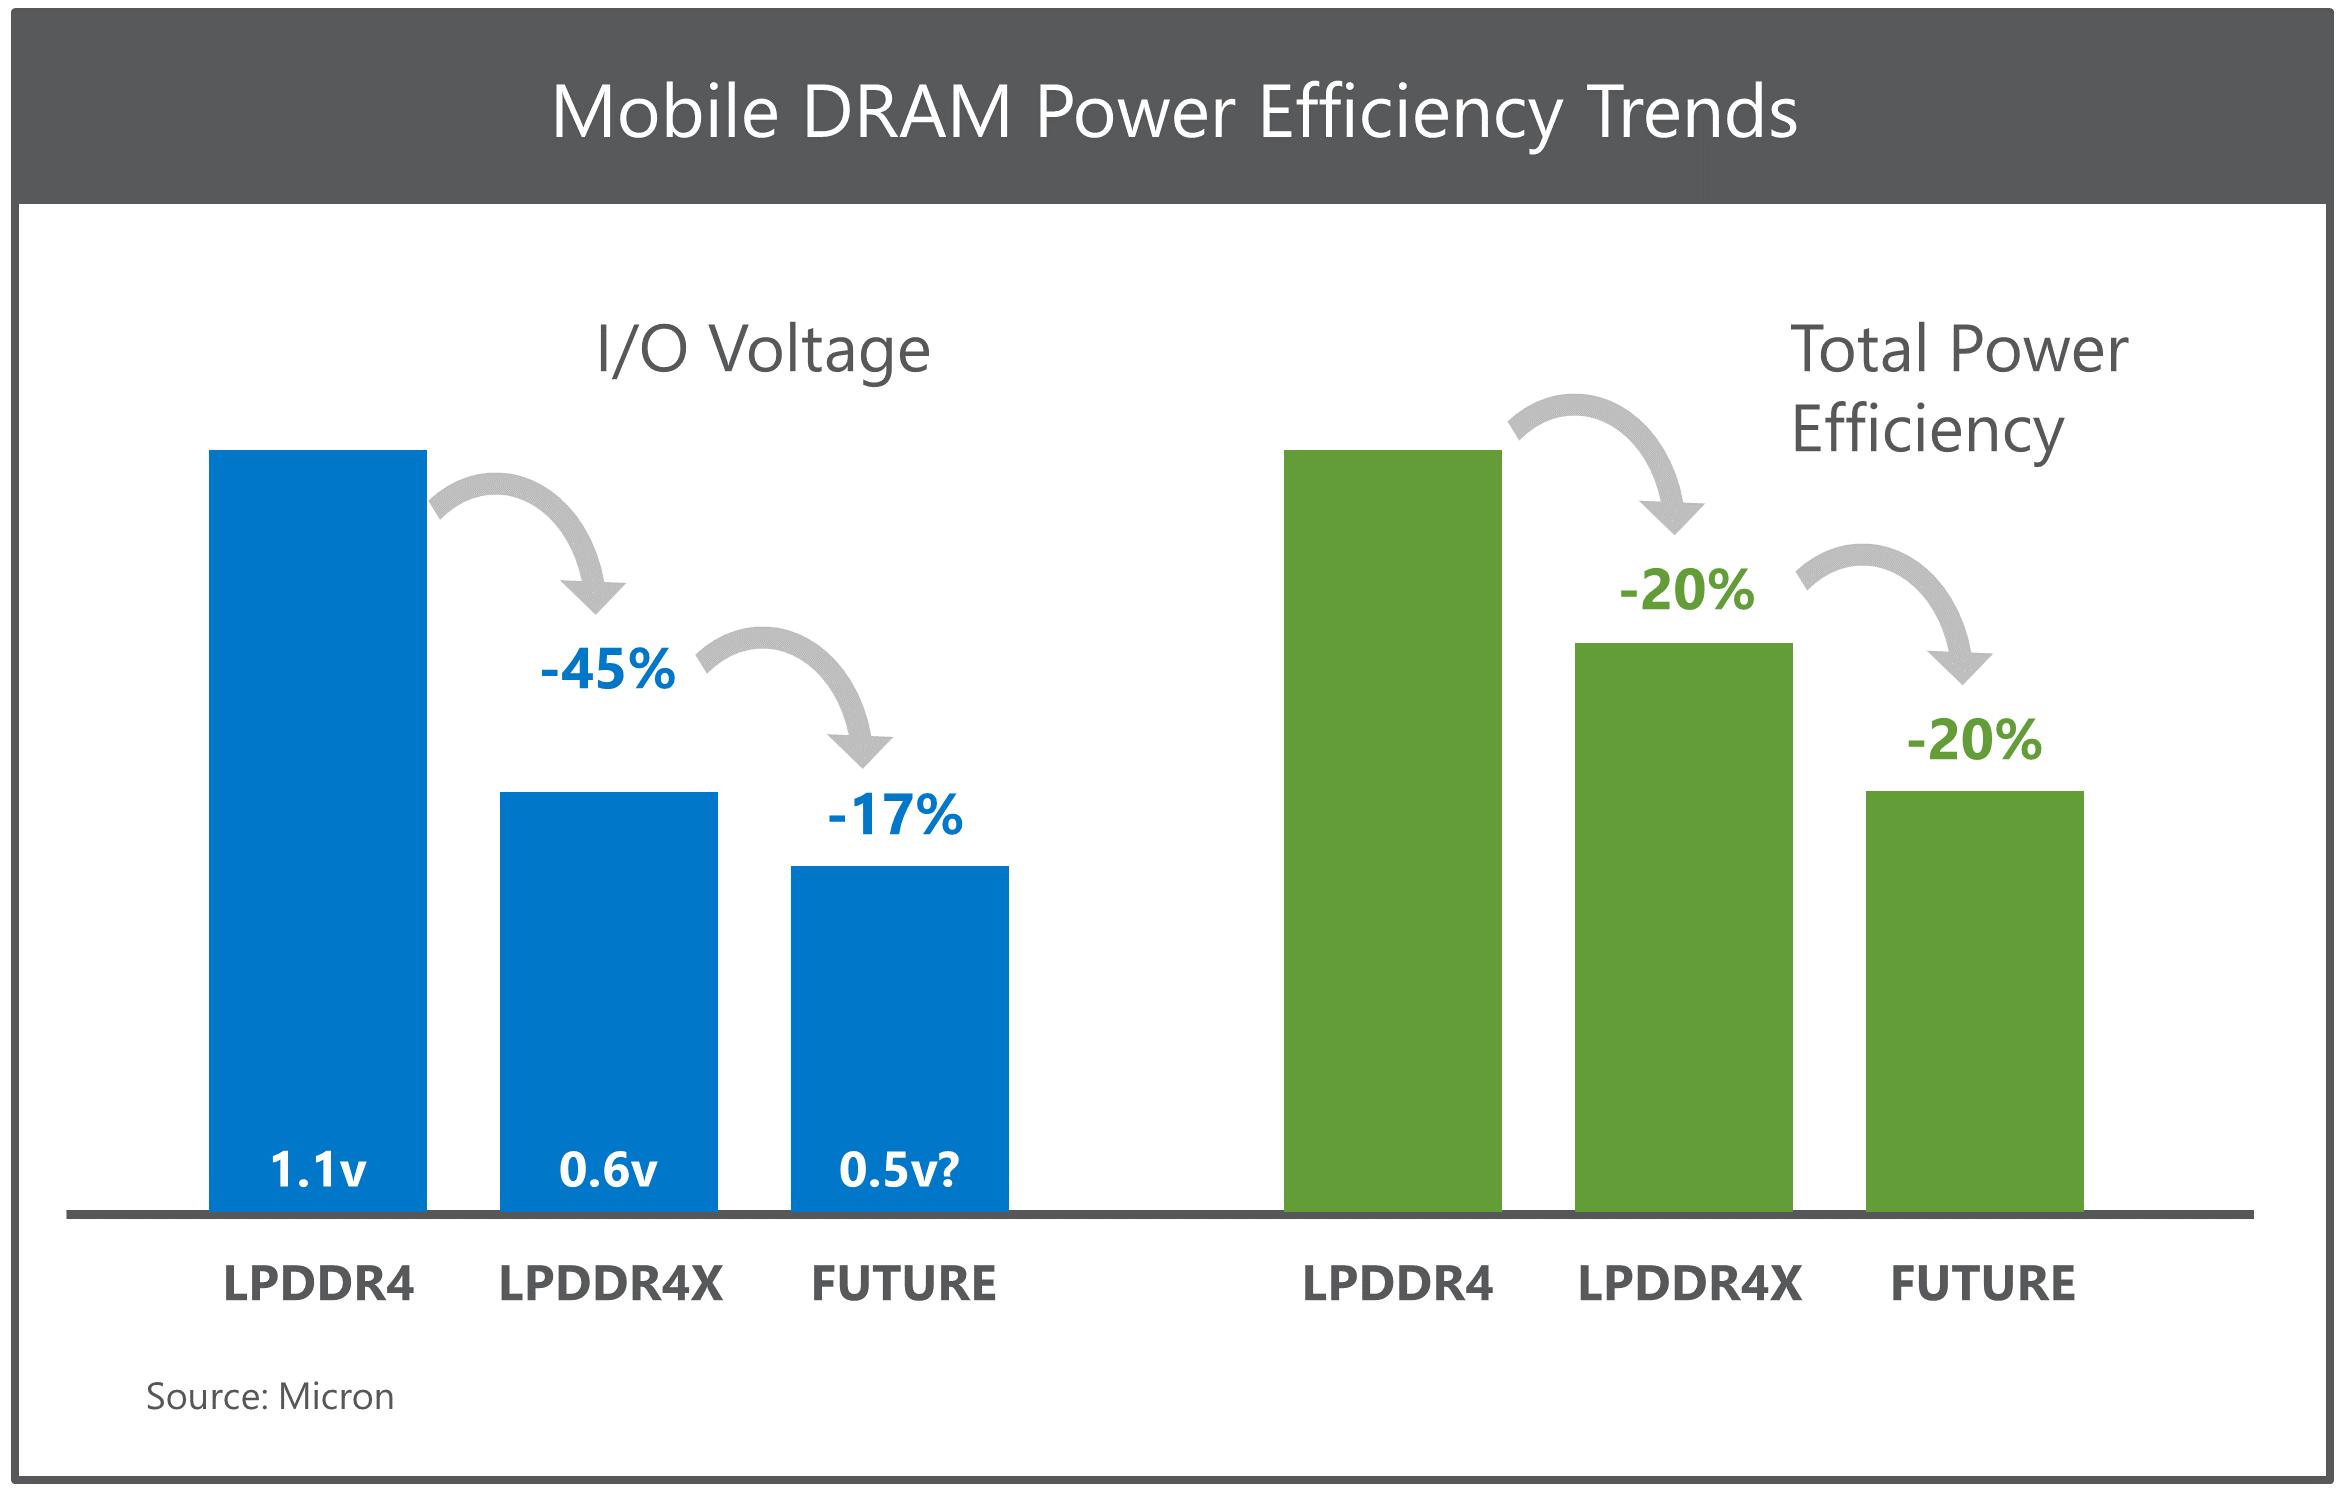 Mobile DRAM Power Efficiency Trends